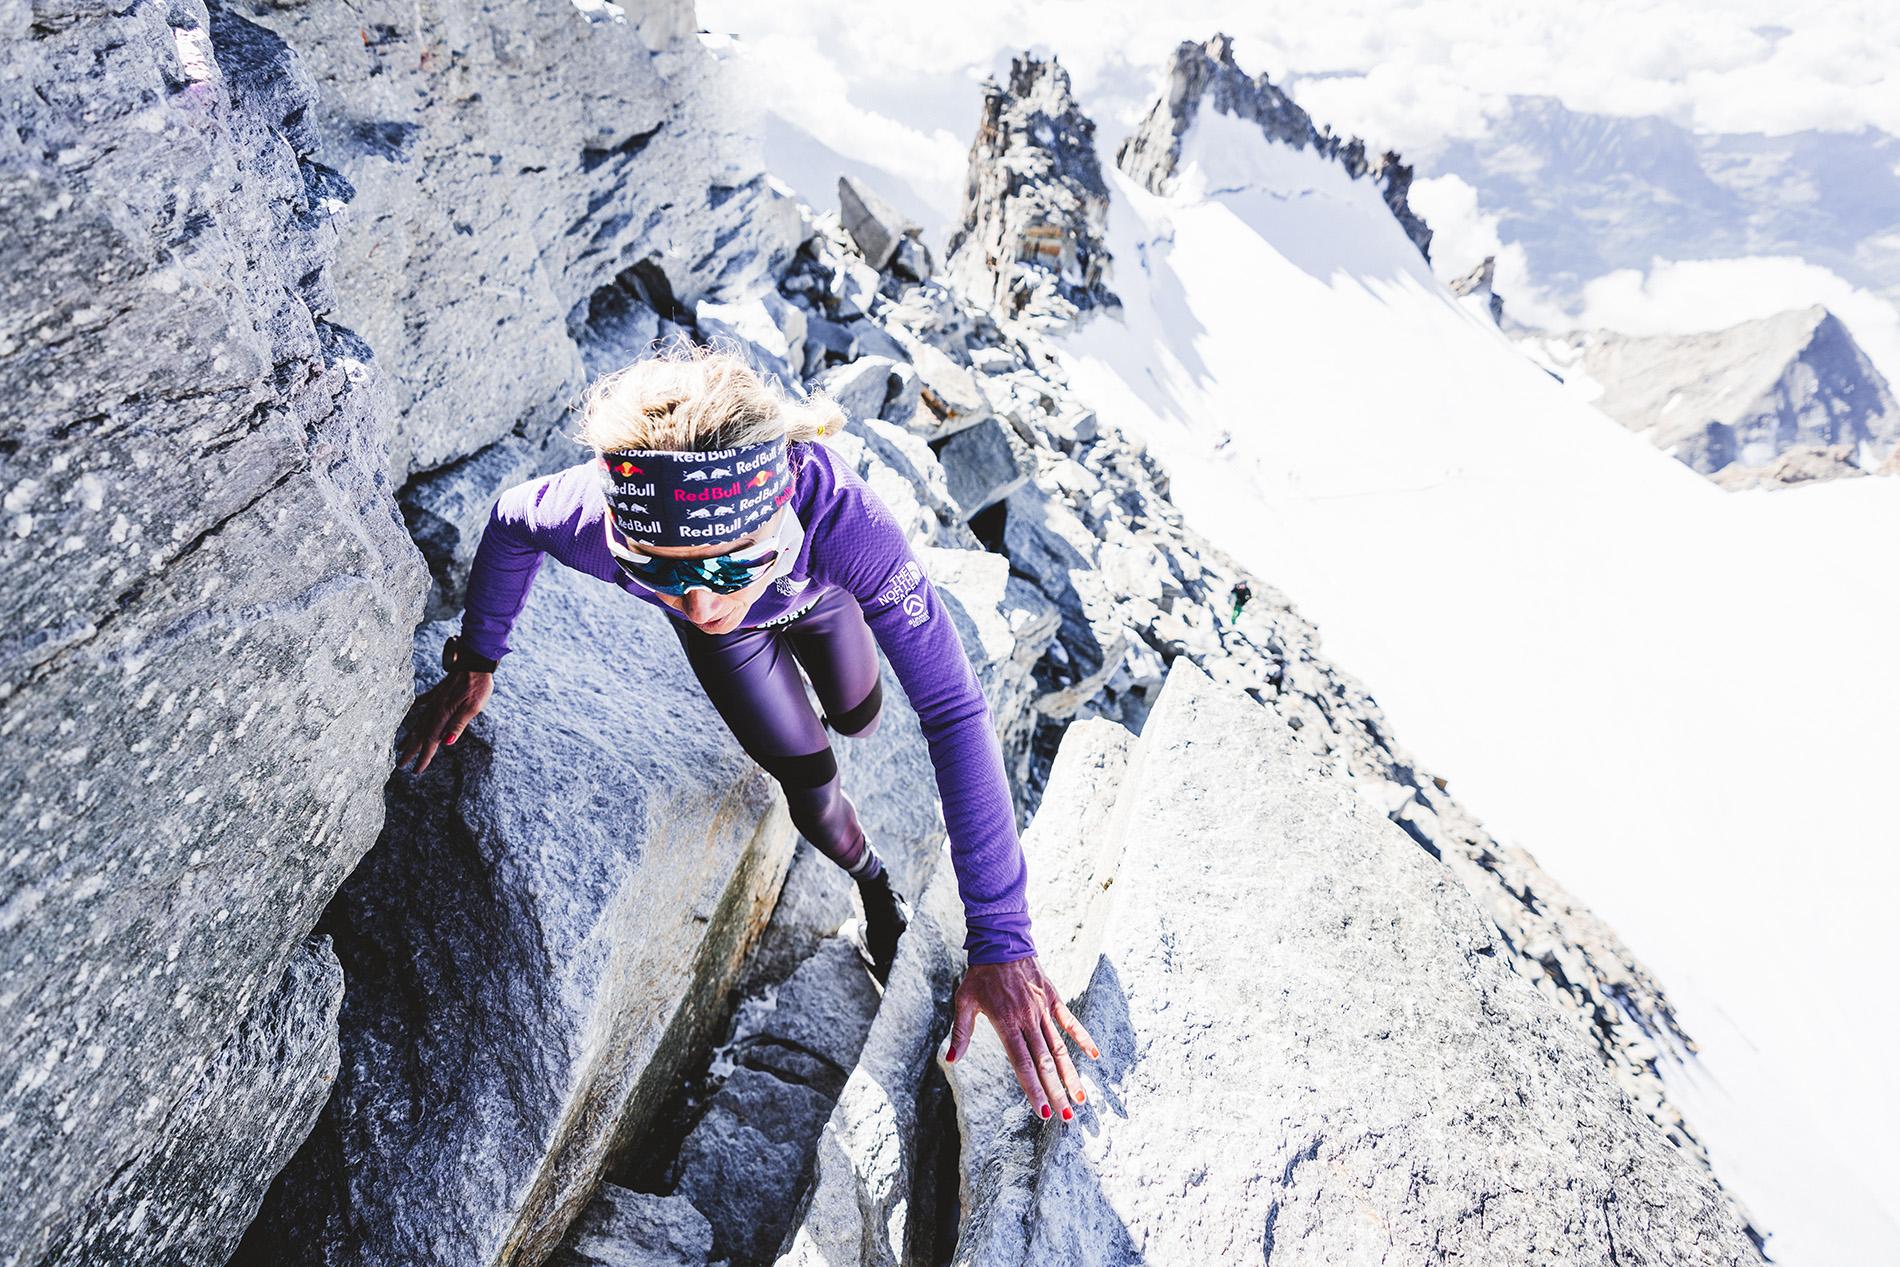 Fernanda Maciel 2020 bei ihrem Rekordlauf auf den Gran Paradiso in 2:40 Stunden. Foto: Mathis Dumas.